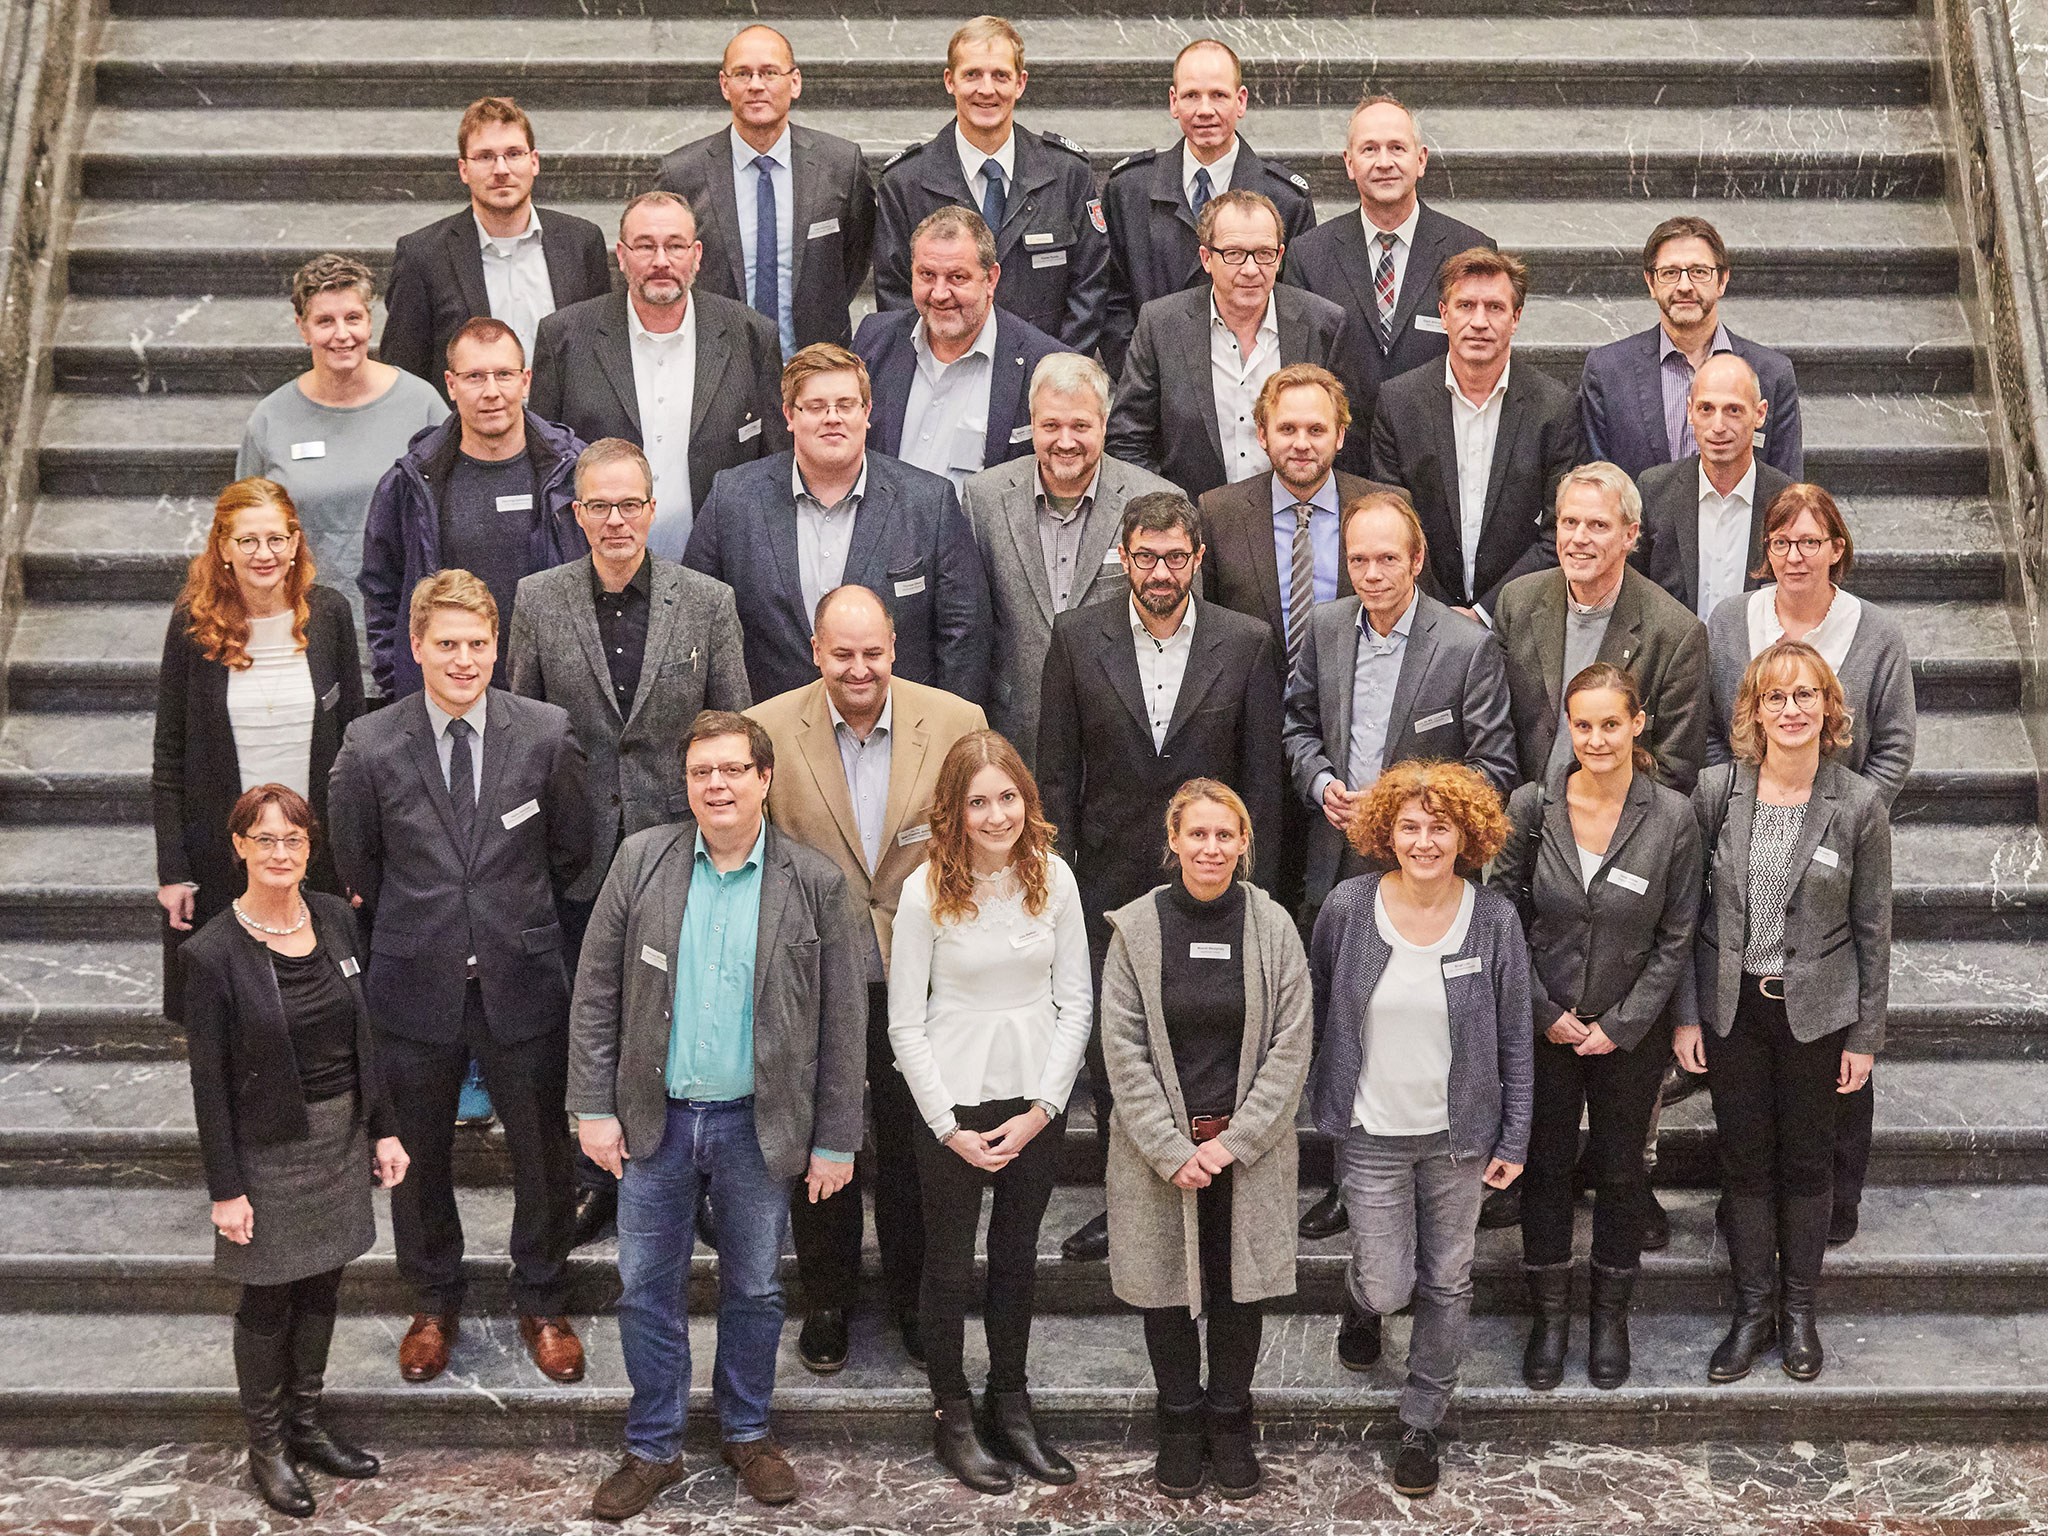 Gruppenfoto der Projektpartner Kick-Off H-stromert